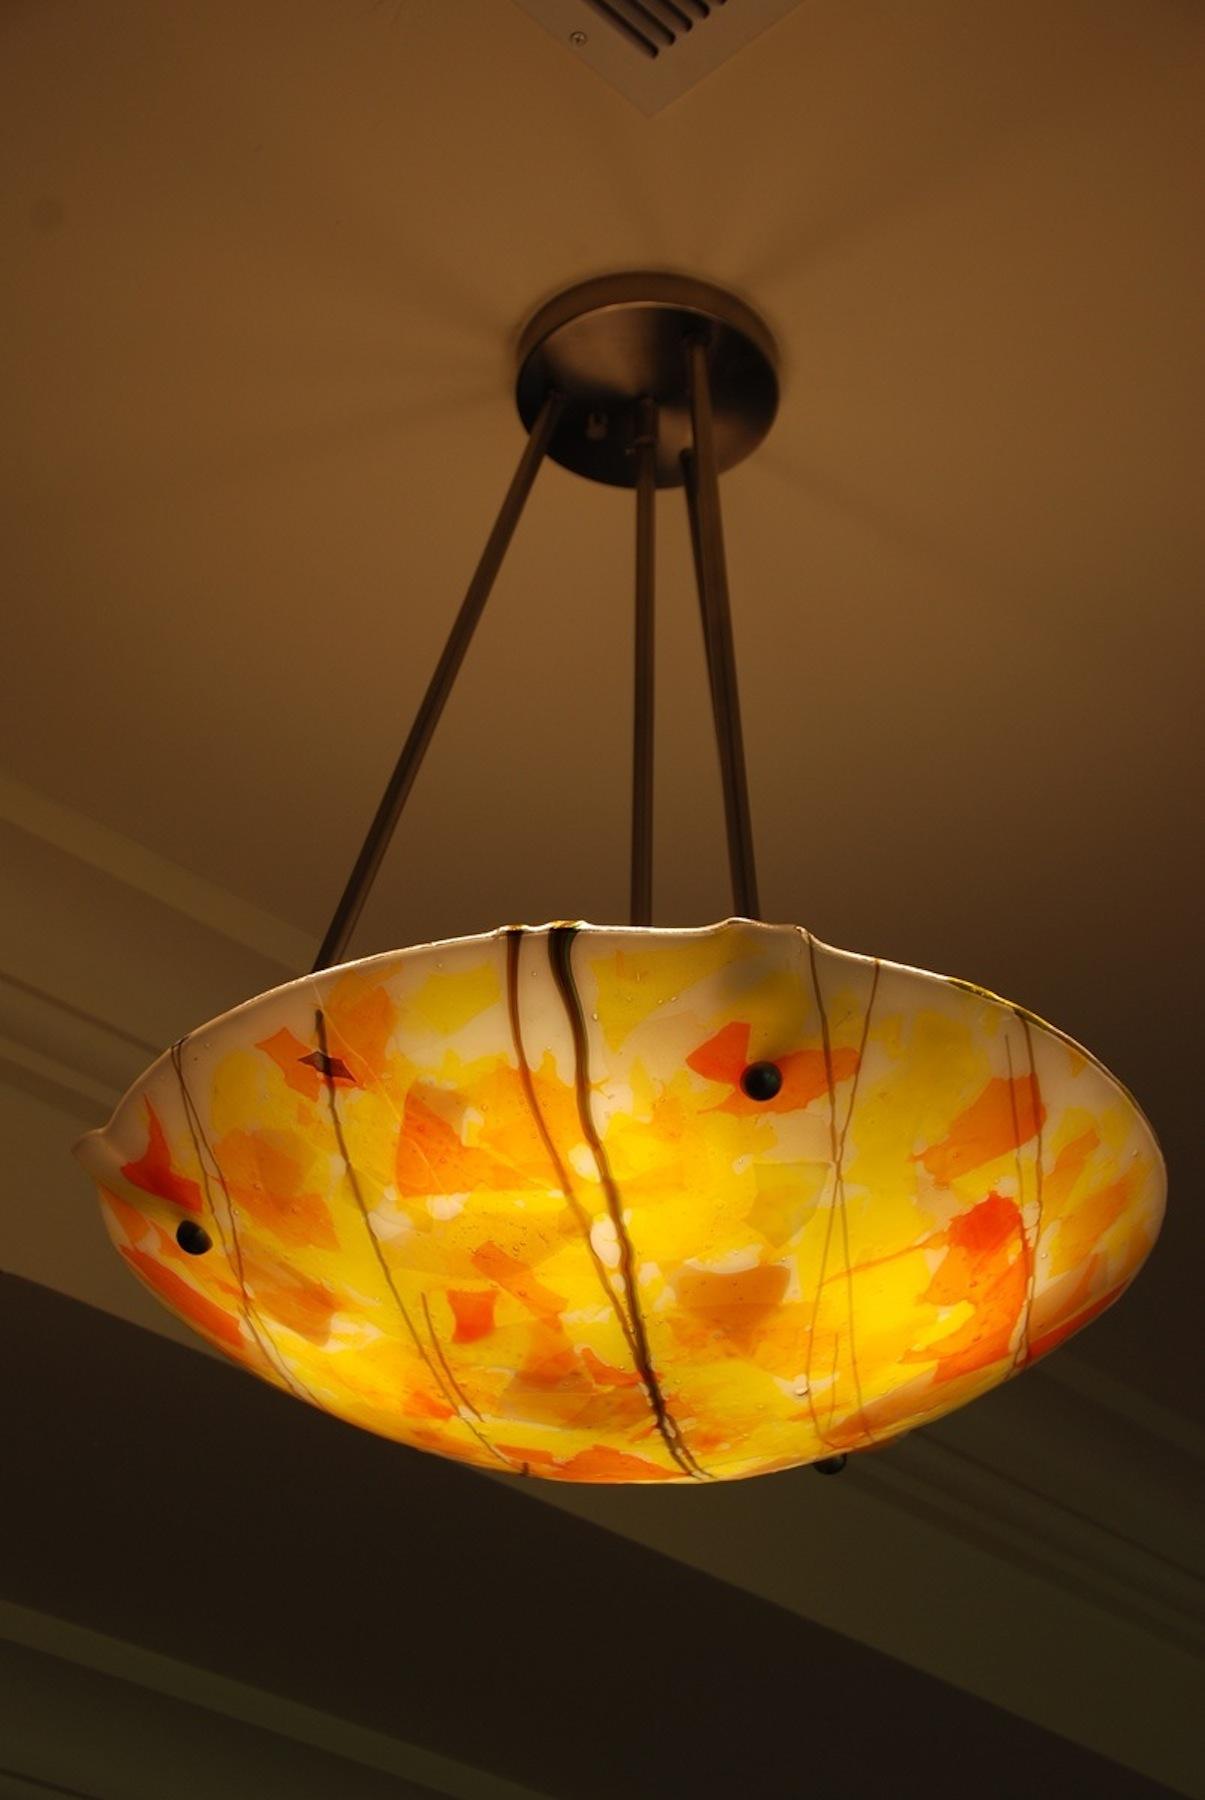 #11 Ceiling Lamp confetti dome by artist rick strini copy.jpg